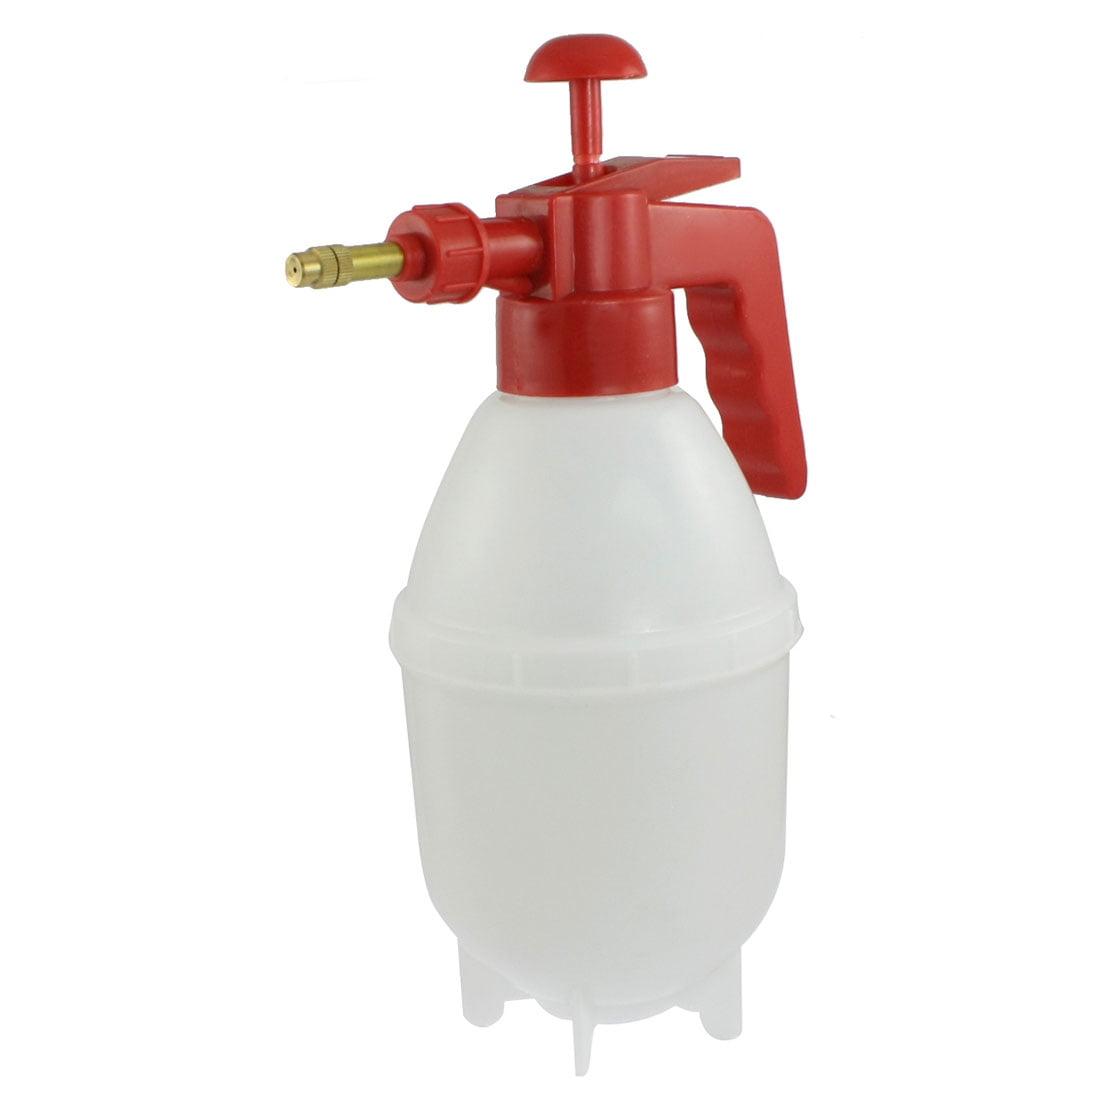 Unique Bargains Plastic Water Spray Bottle Pressurized Sprayer Red White by